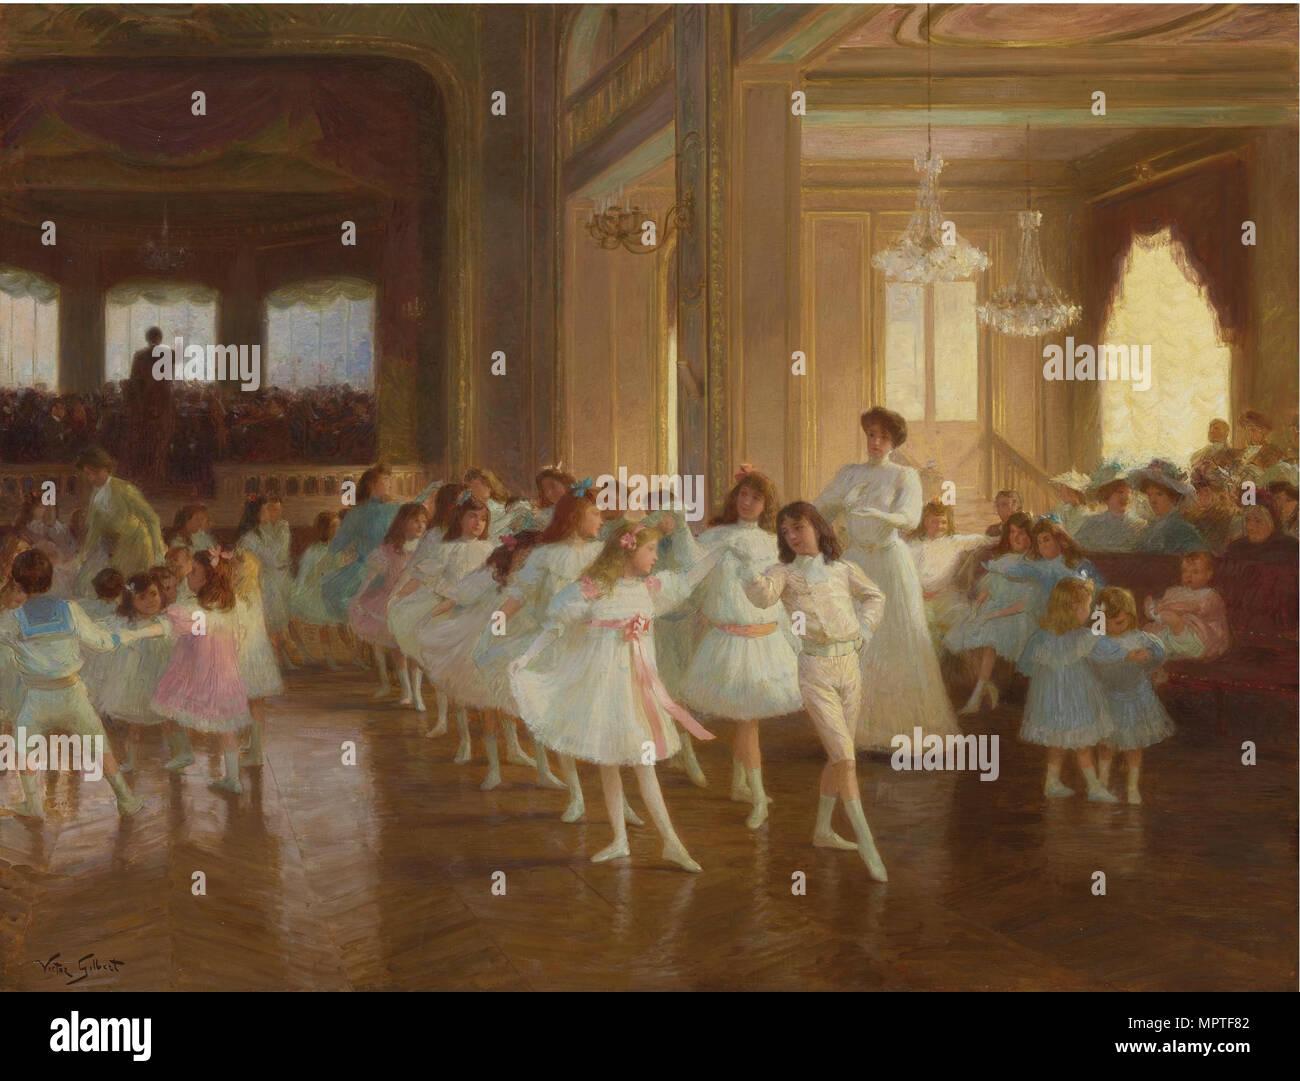 The Children's Dance Recital at the Casino de Dieppe, . - Stock Image